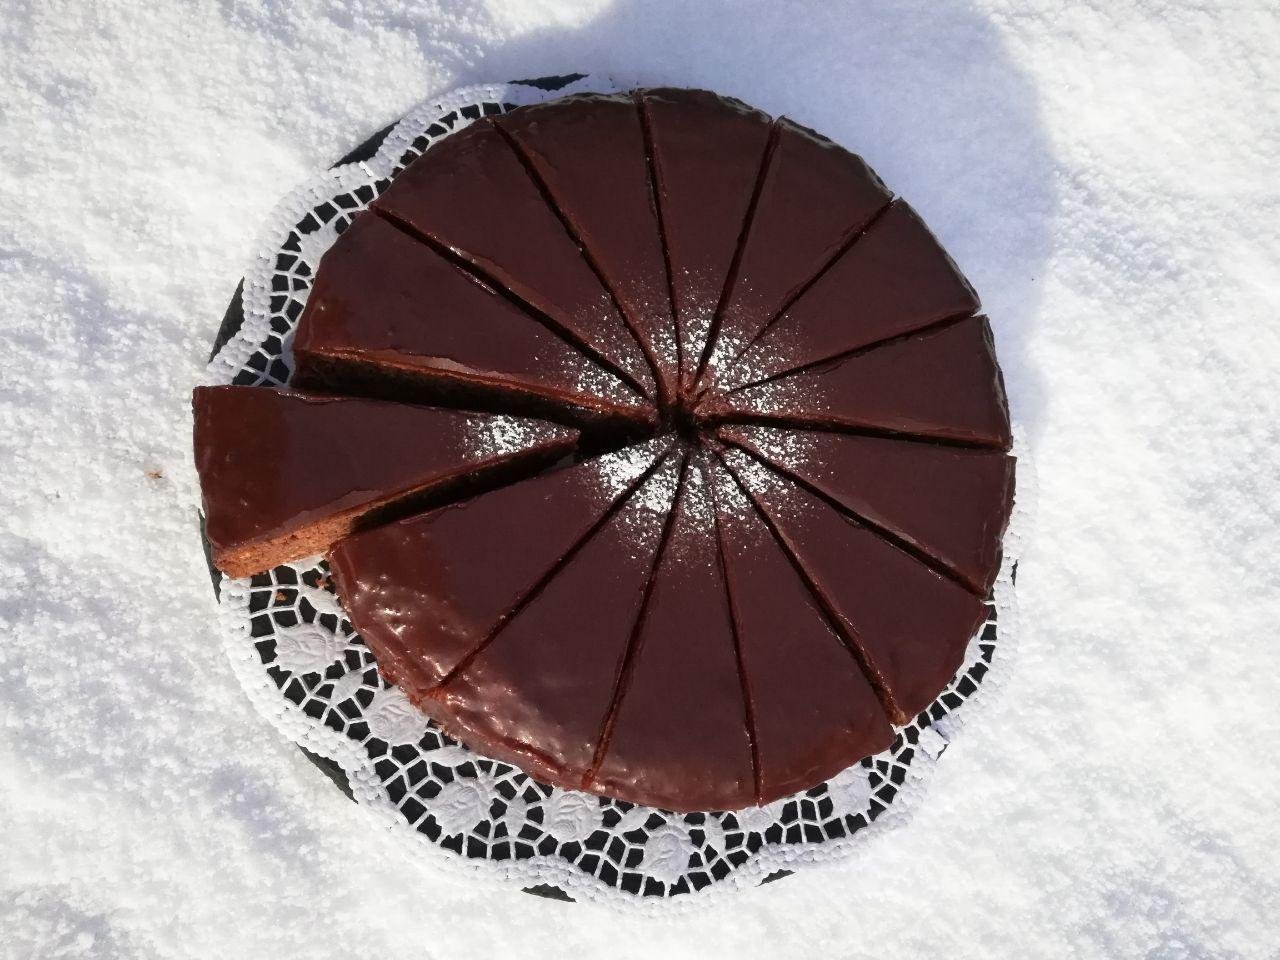 Schokoladen-Nuss Torte